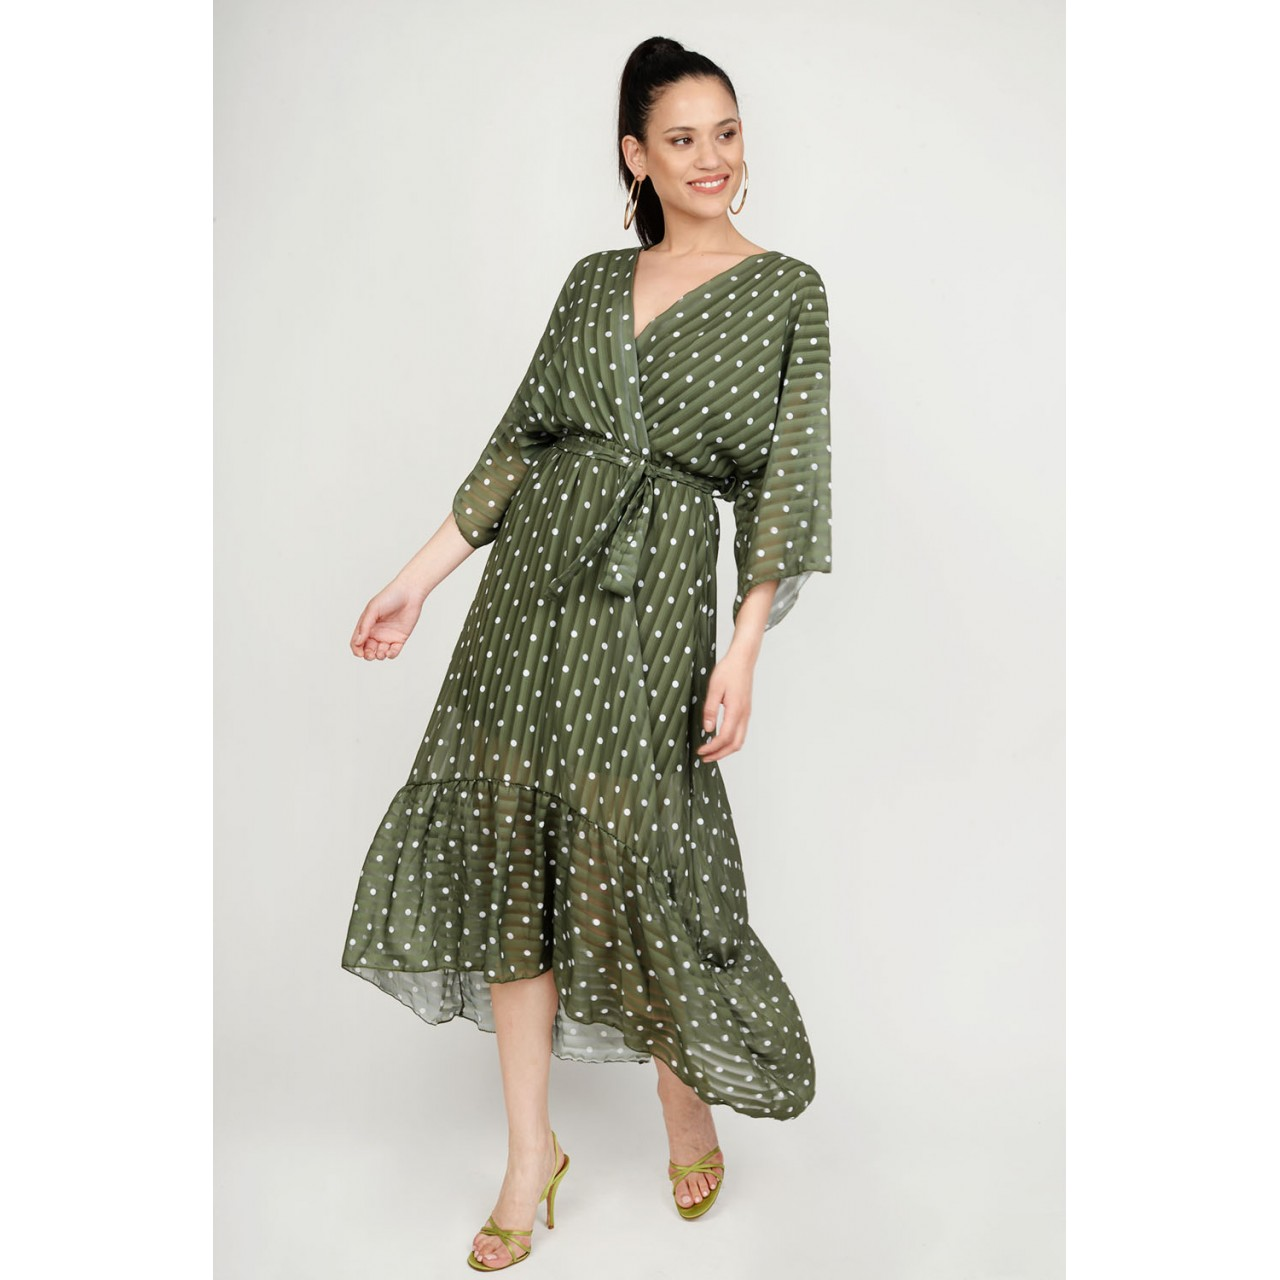 1b720084ec1 ... Φόρεμα ασύμμετρο πουά Limited Edition